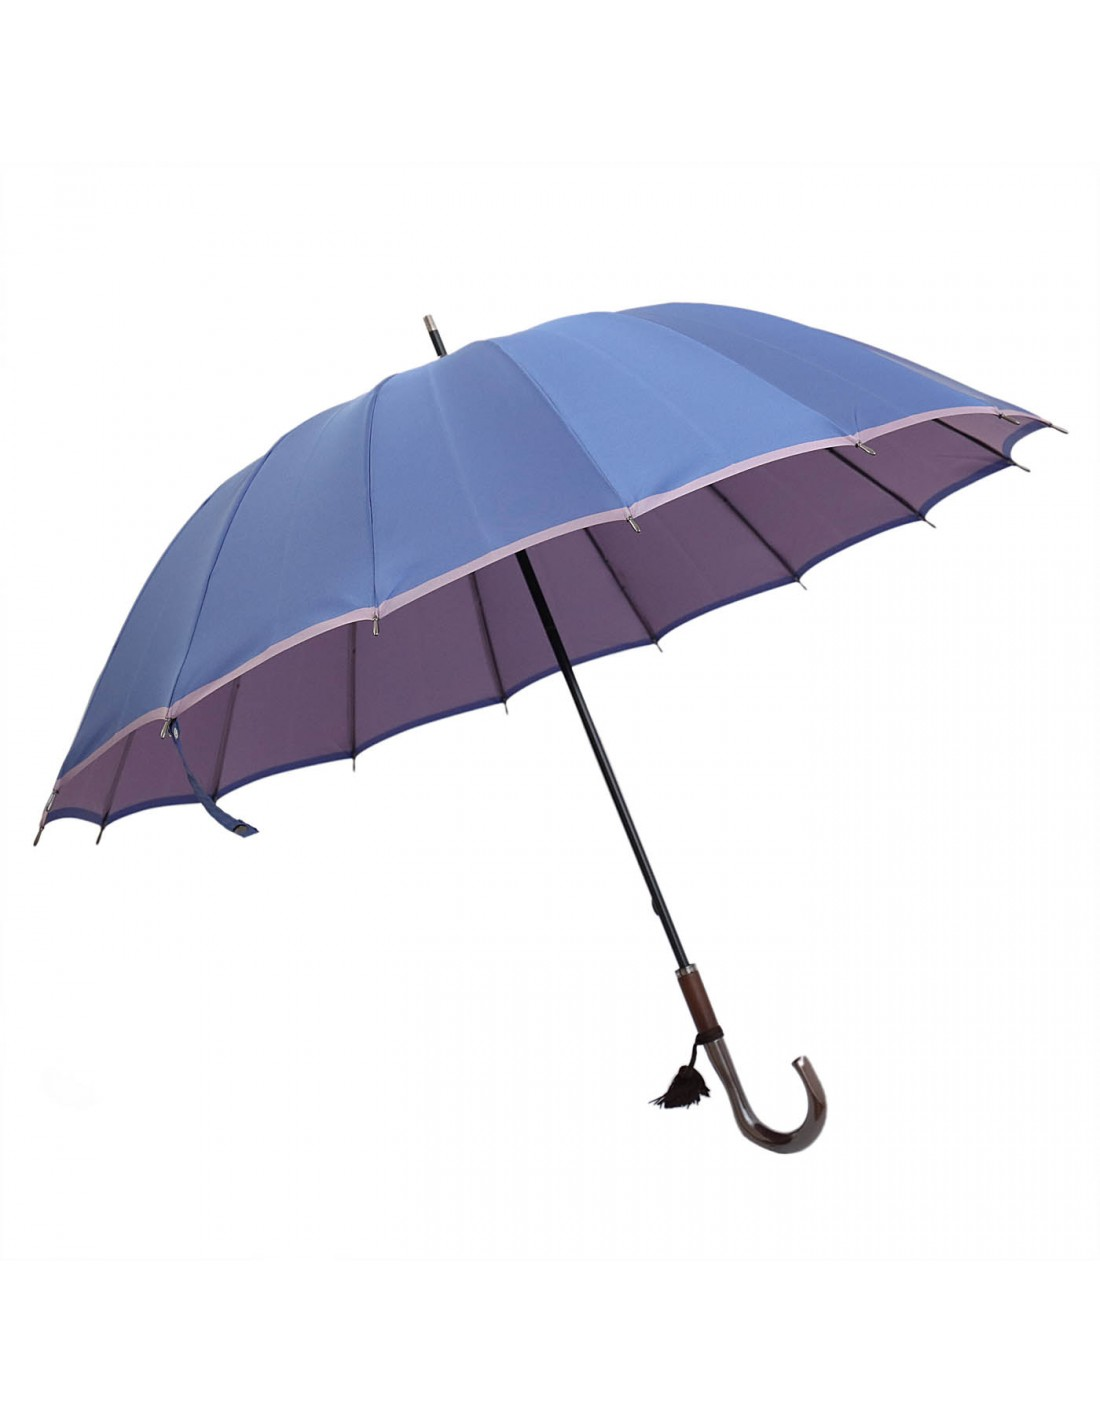 Damen Regenschirm Himmelblau/Lavendel